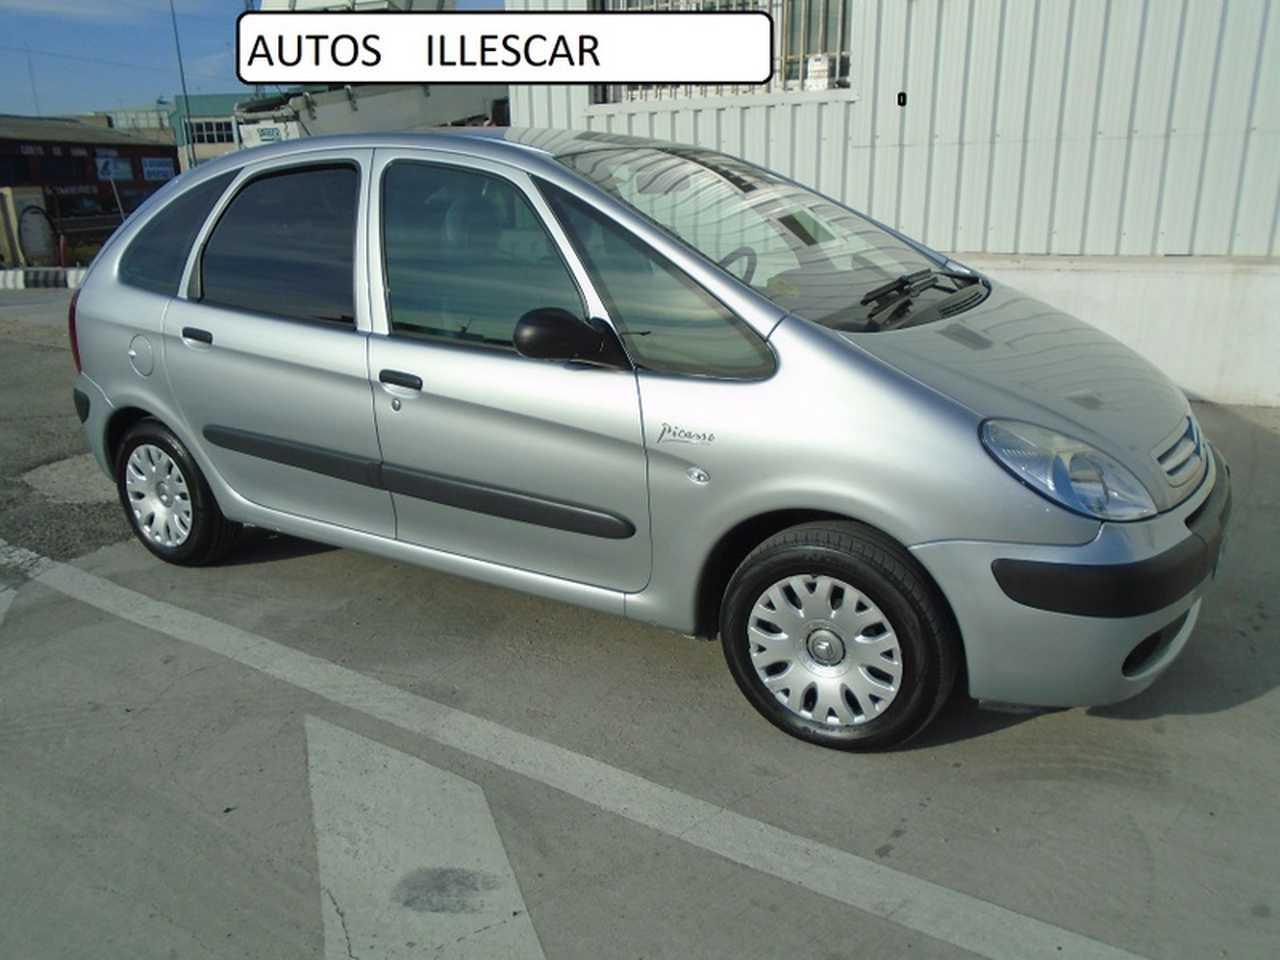 Citroën Xsara Picasso 1.6 HDI 90 CV MEJOR VER   - Foto 1